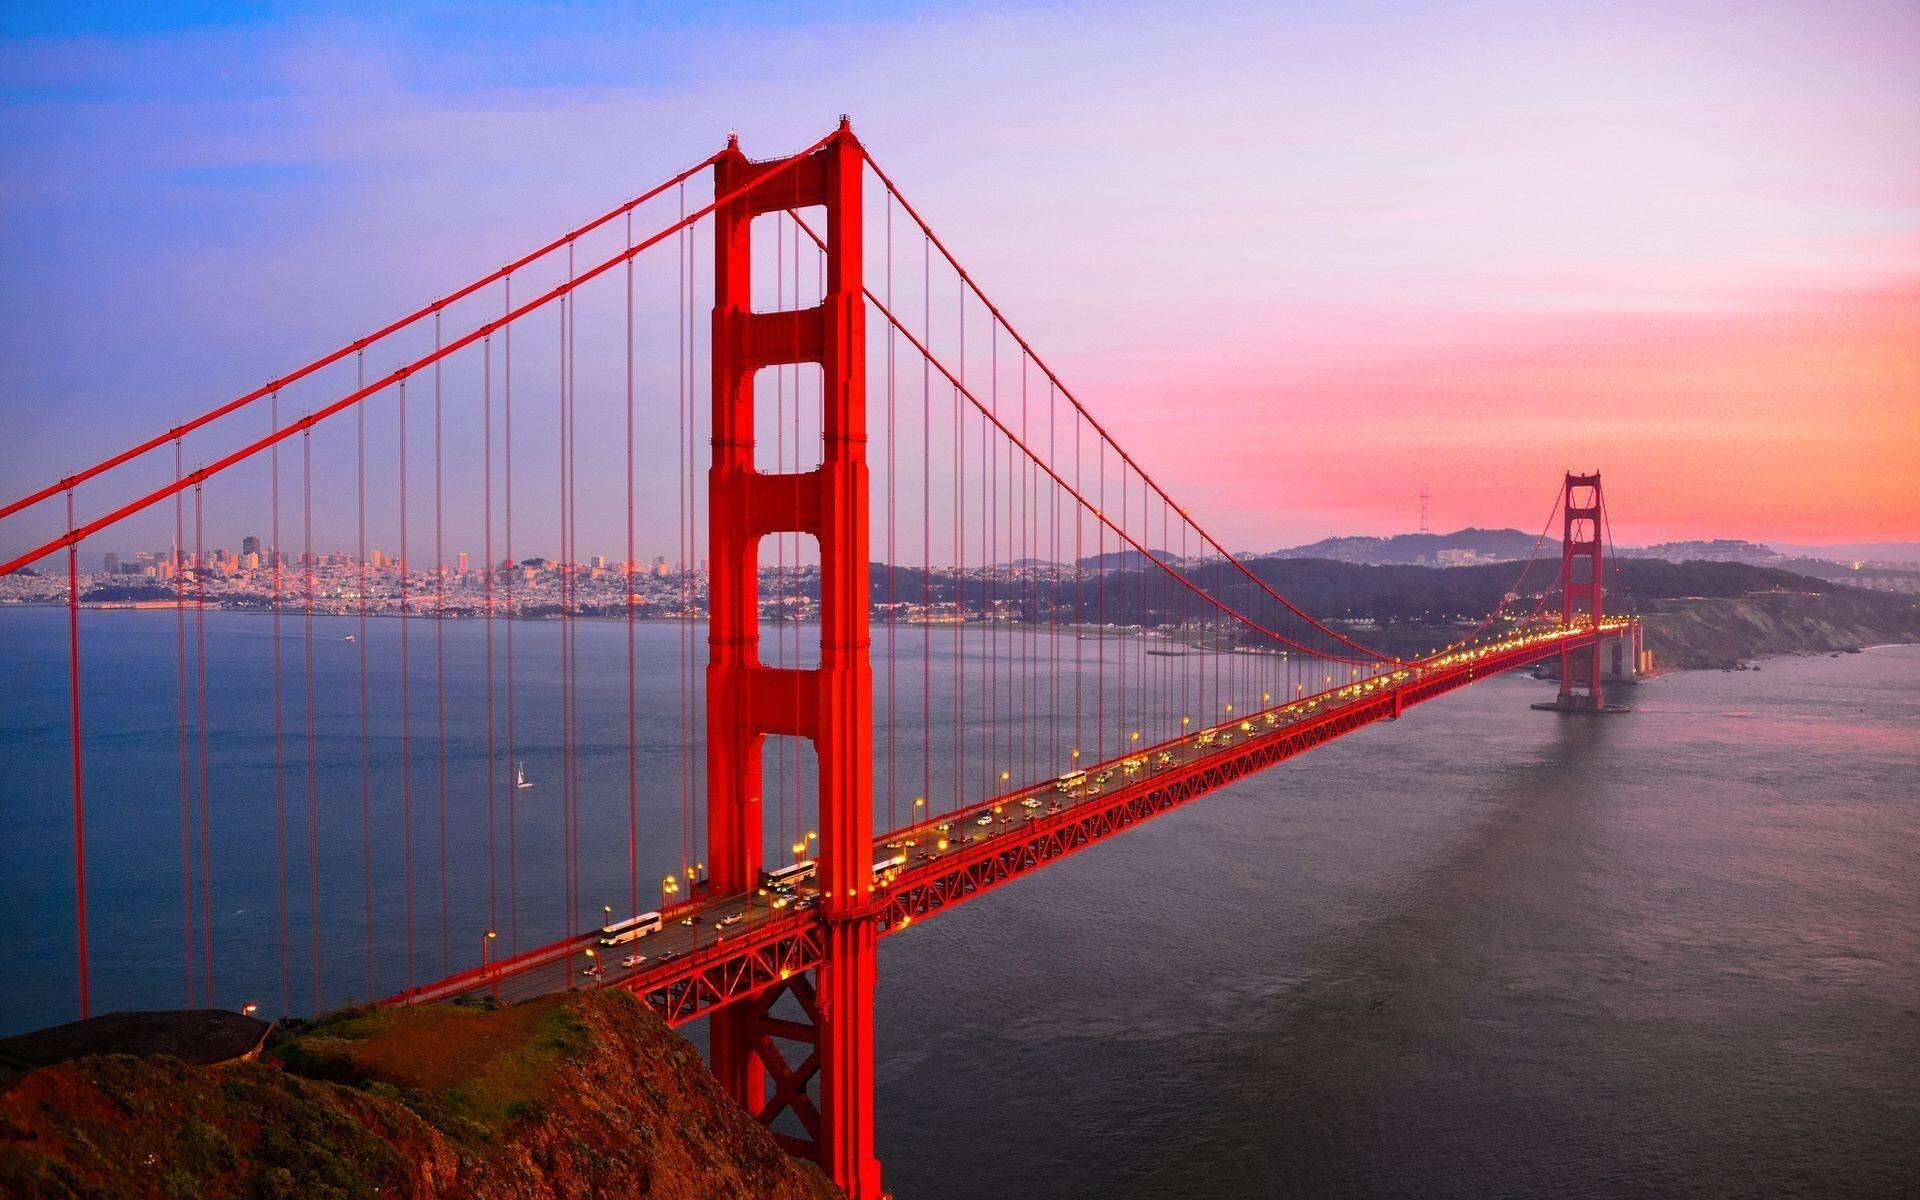 Amazing Golden Gate Bridge San Francisco California US HD